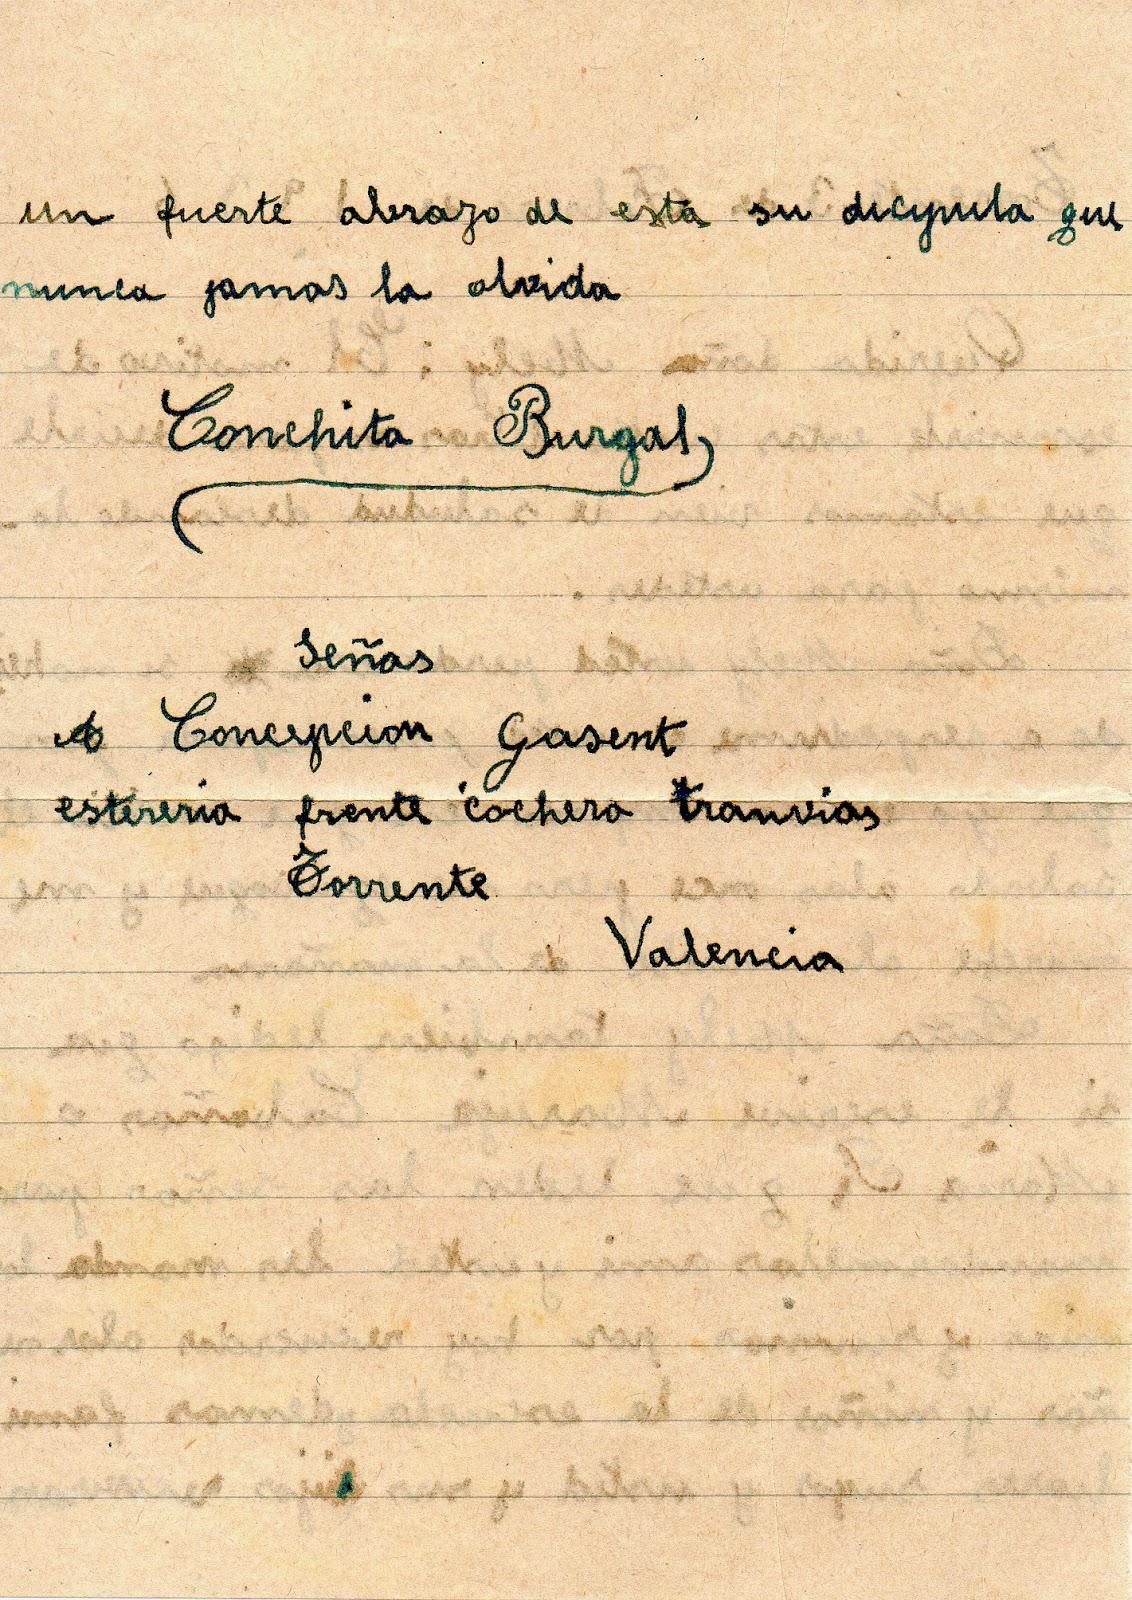 Melitina Álvaro Blázquez - 1936 - Carta de alumna y 2